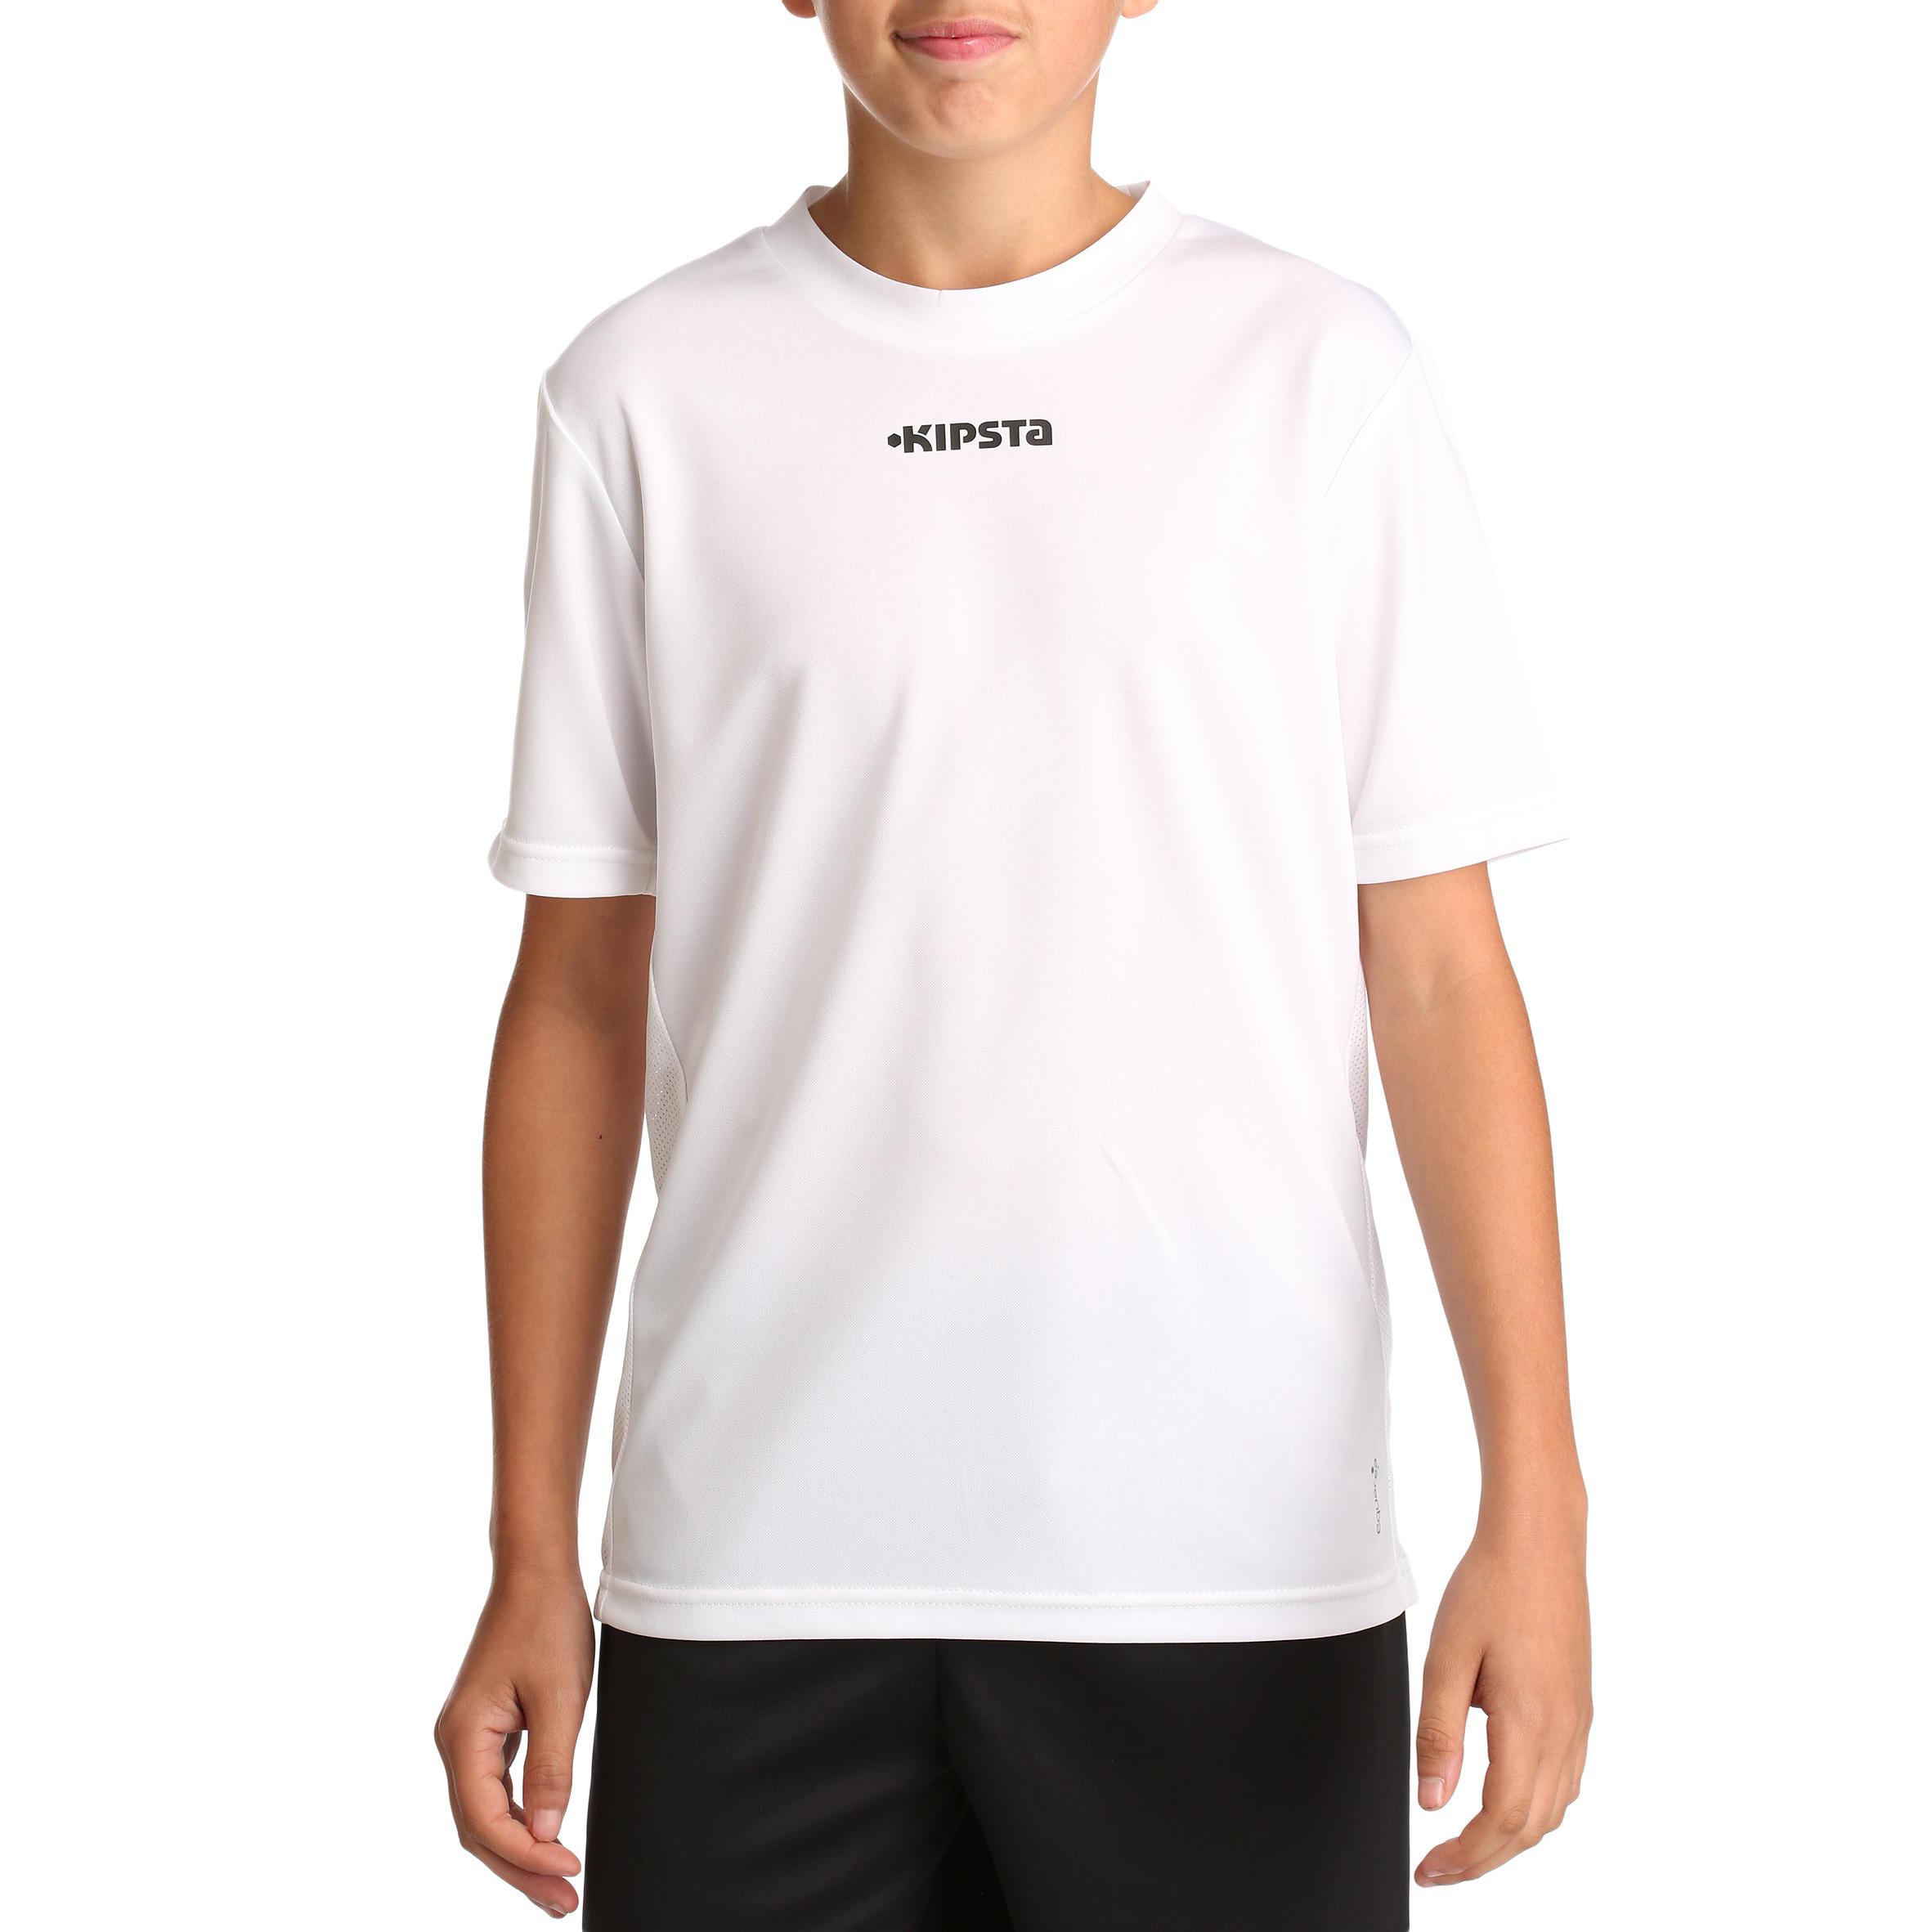 F300 Junior Football Shirt - White